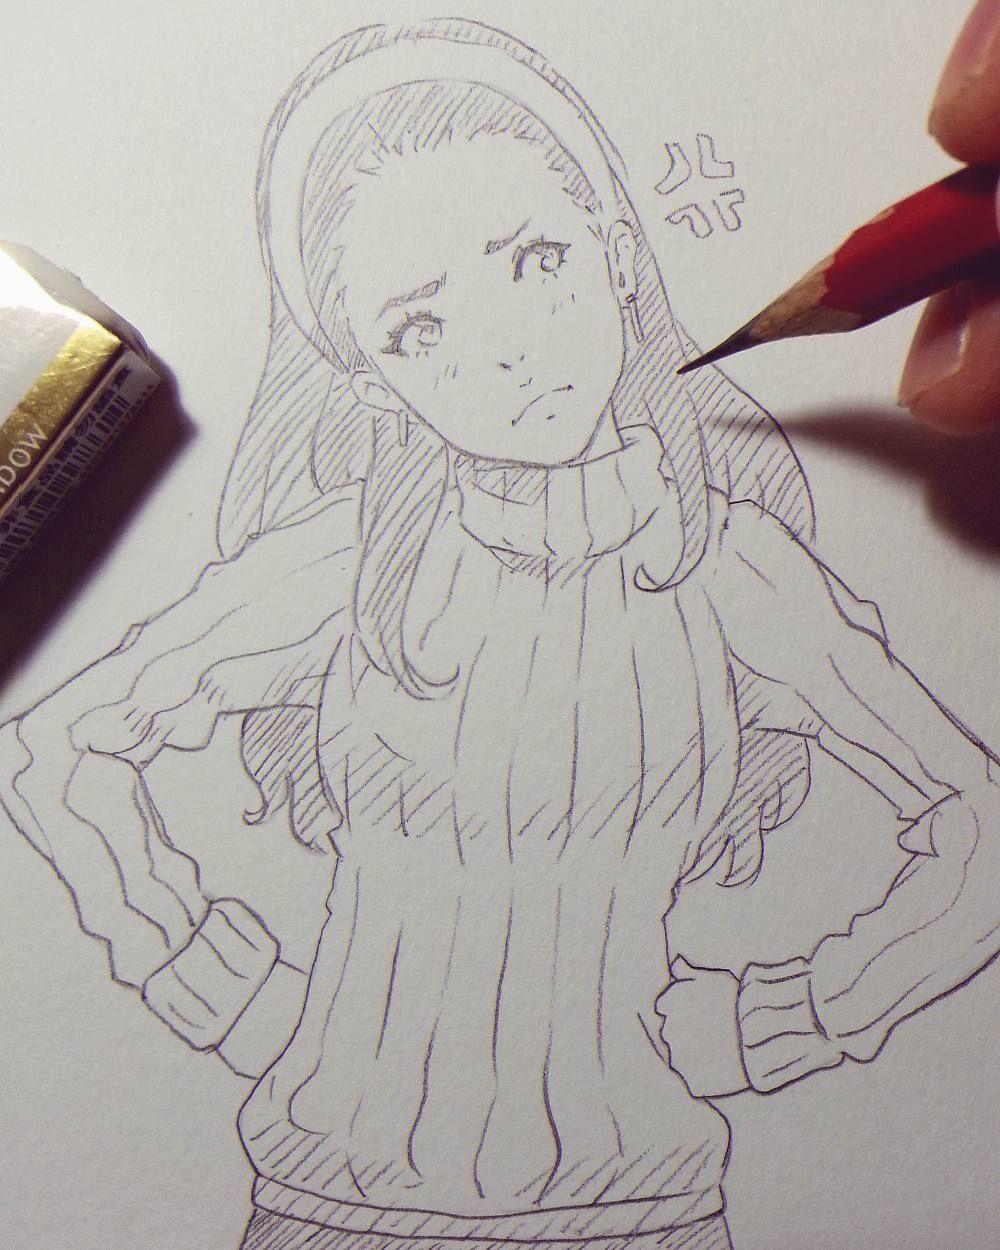 Regram magion02 weekend traditional quickie raine loire ラクガキ pencil sketch